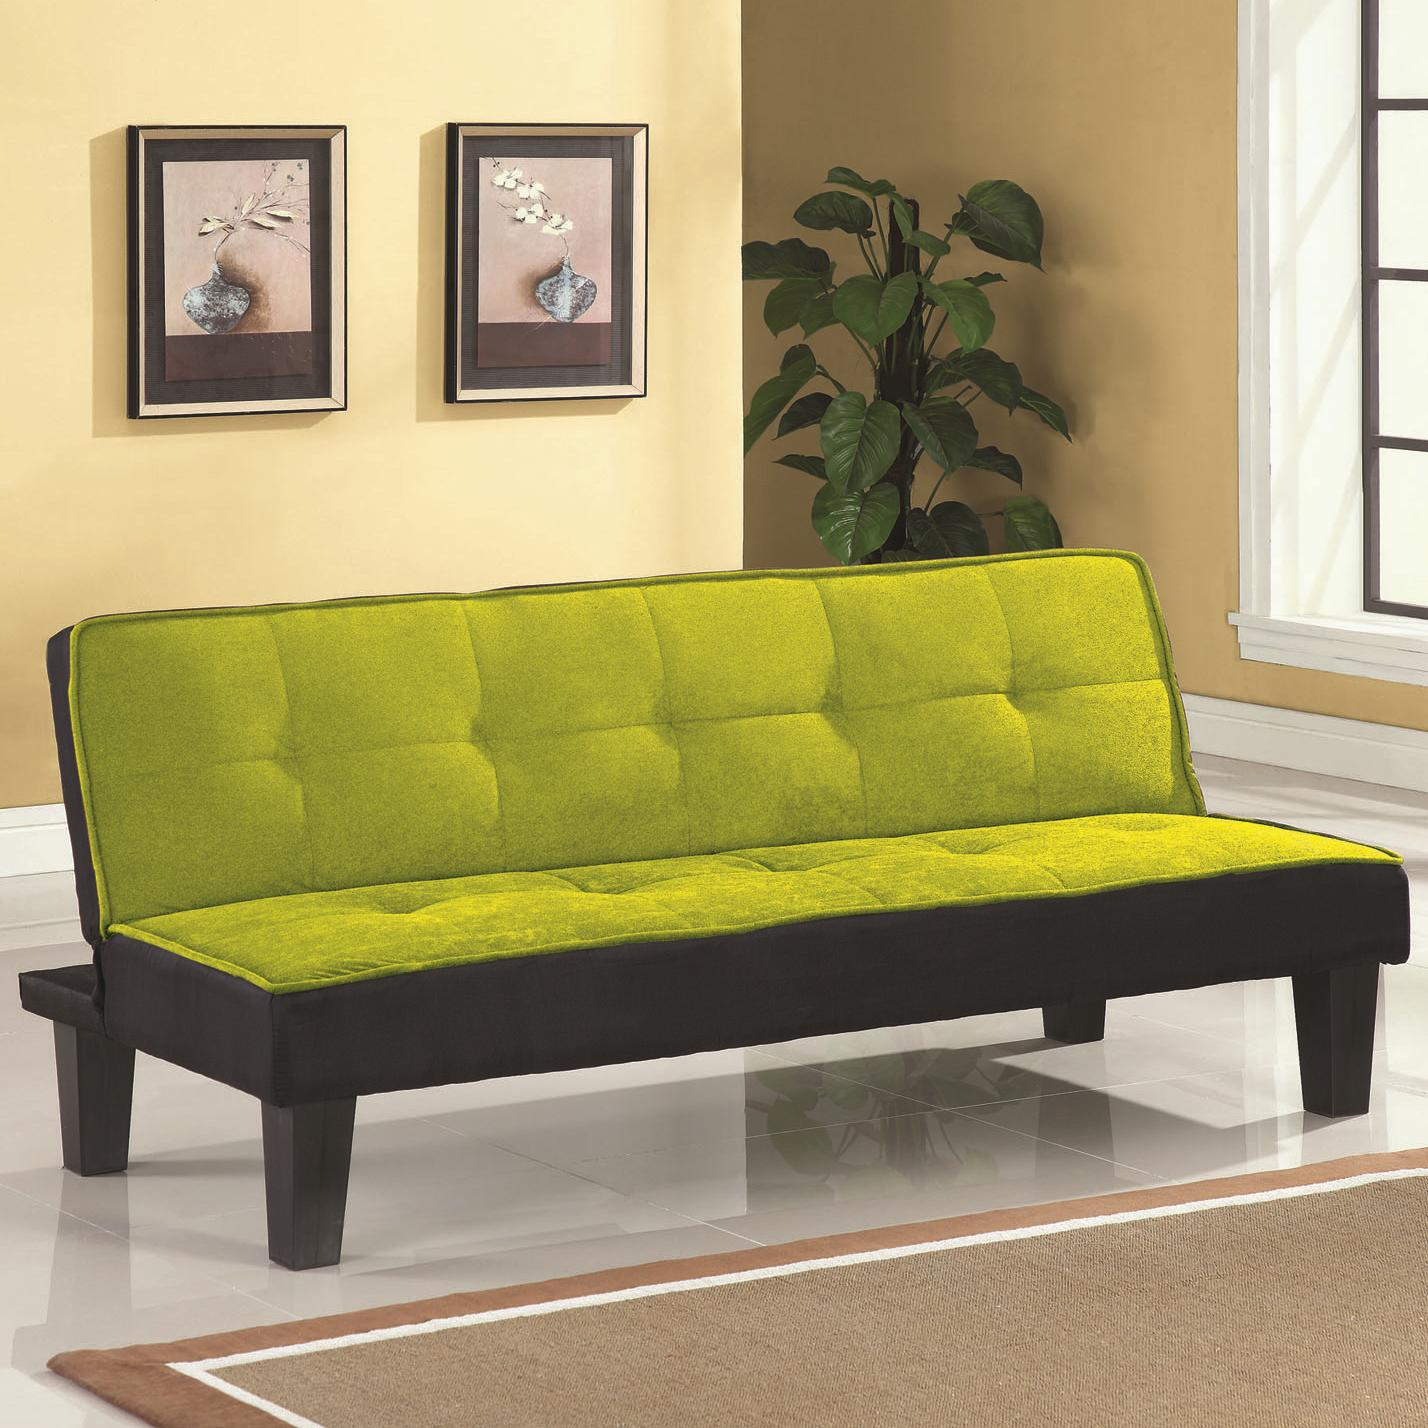 Acme Furniture Hamar  Adjustable Sofa - Item Number: 57039